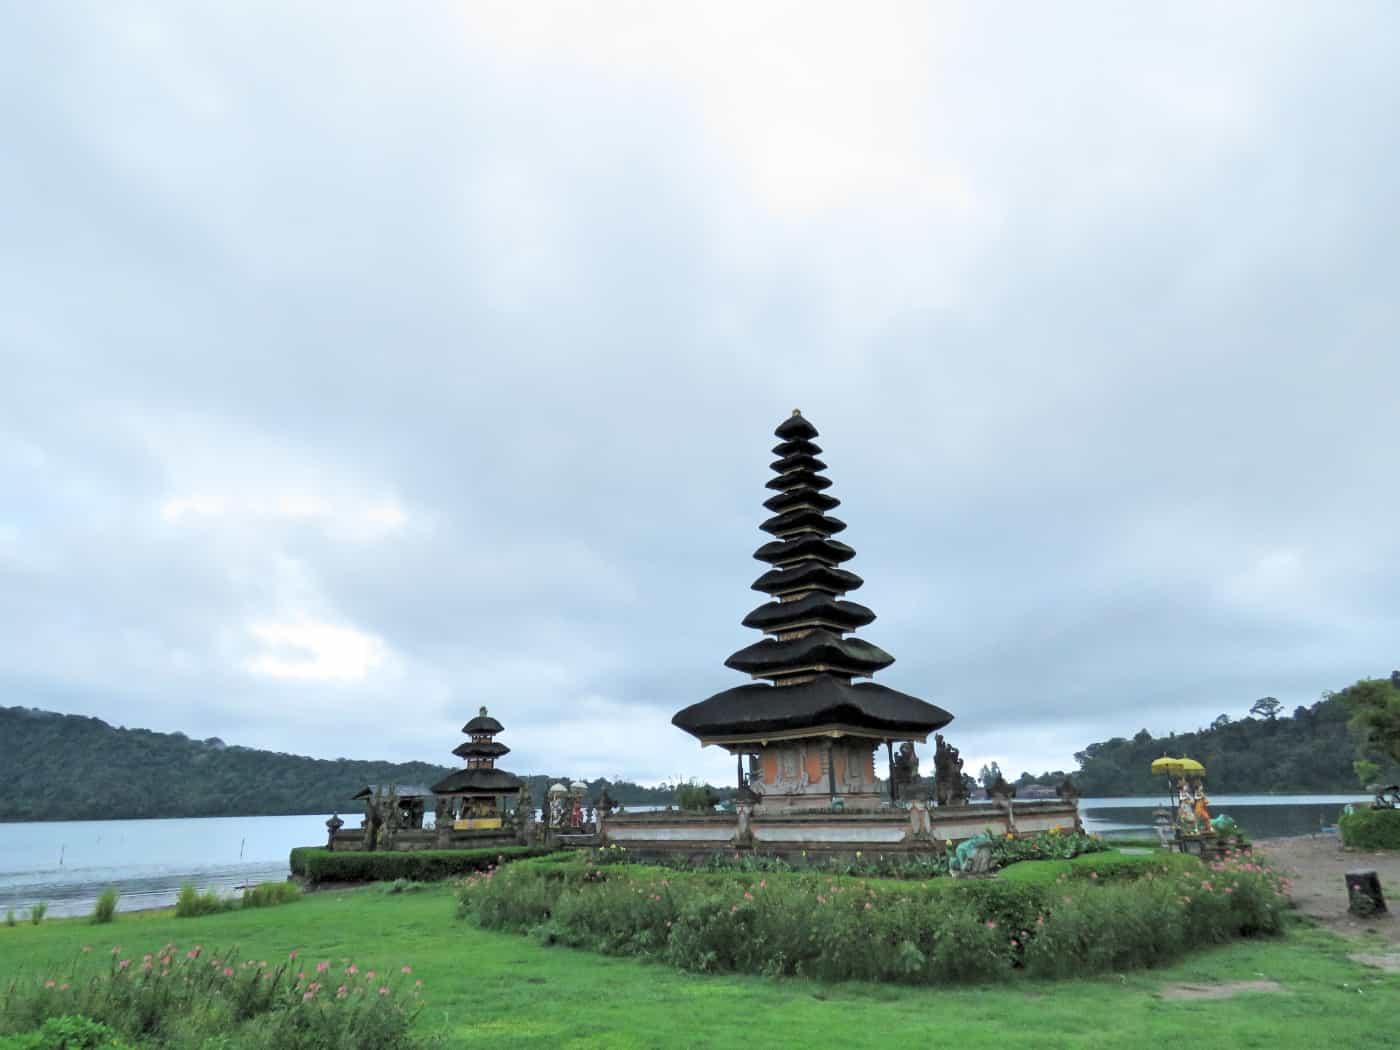 gogirlrun_bali_indonesien_privatetour_norden_Pura Ulun Danu Bratan_83